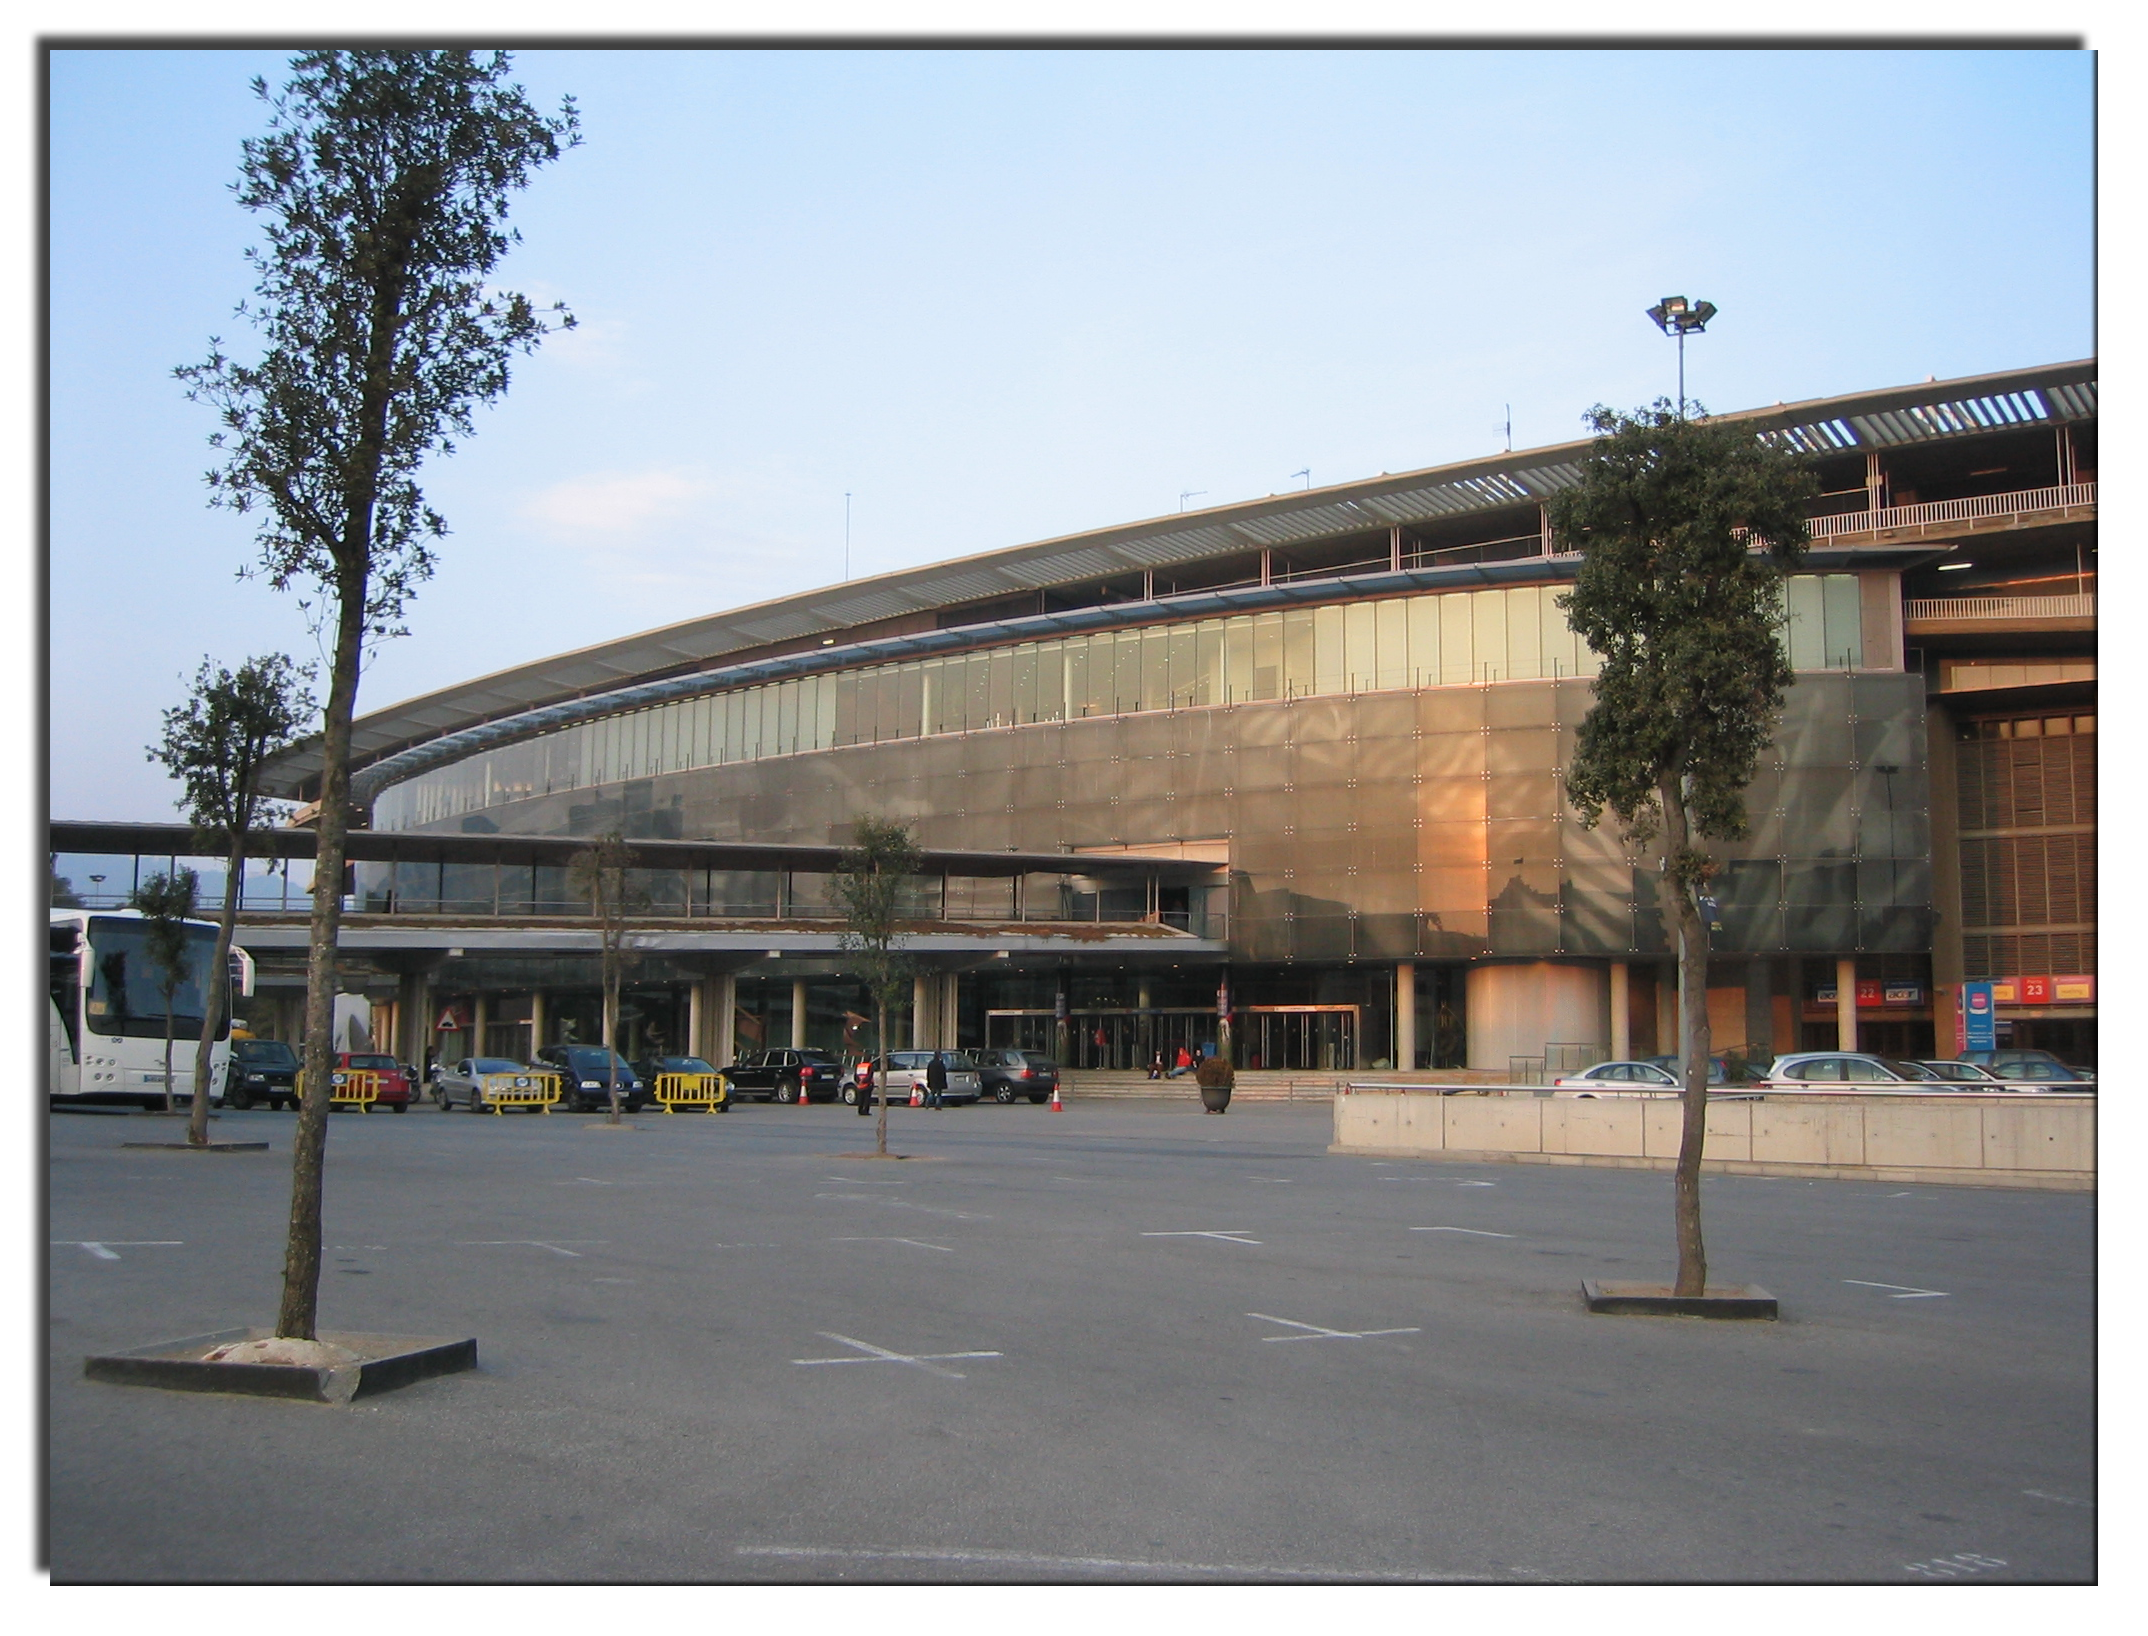 camp-nou-stadium1